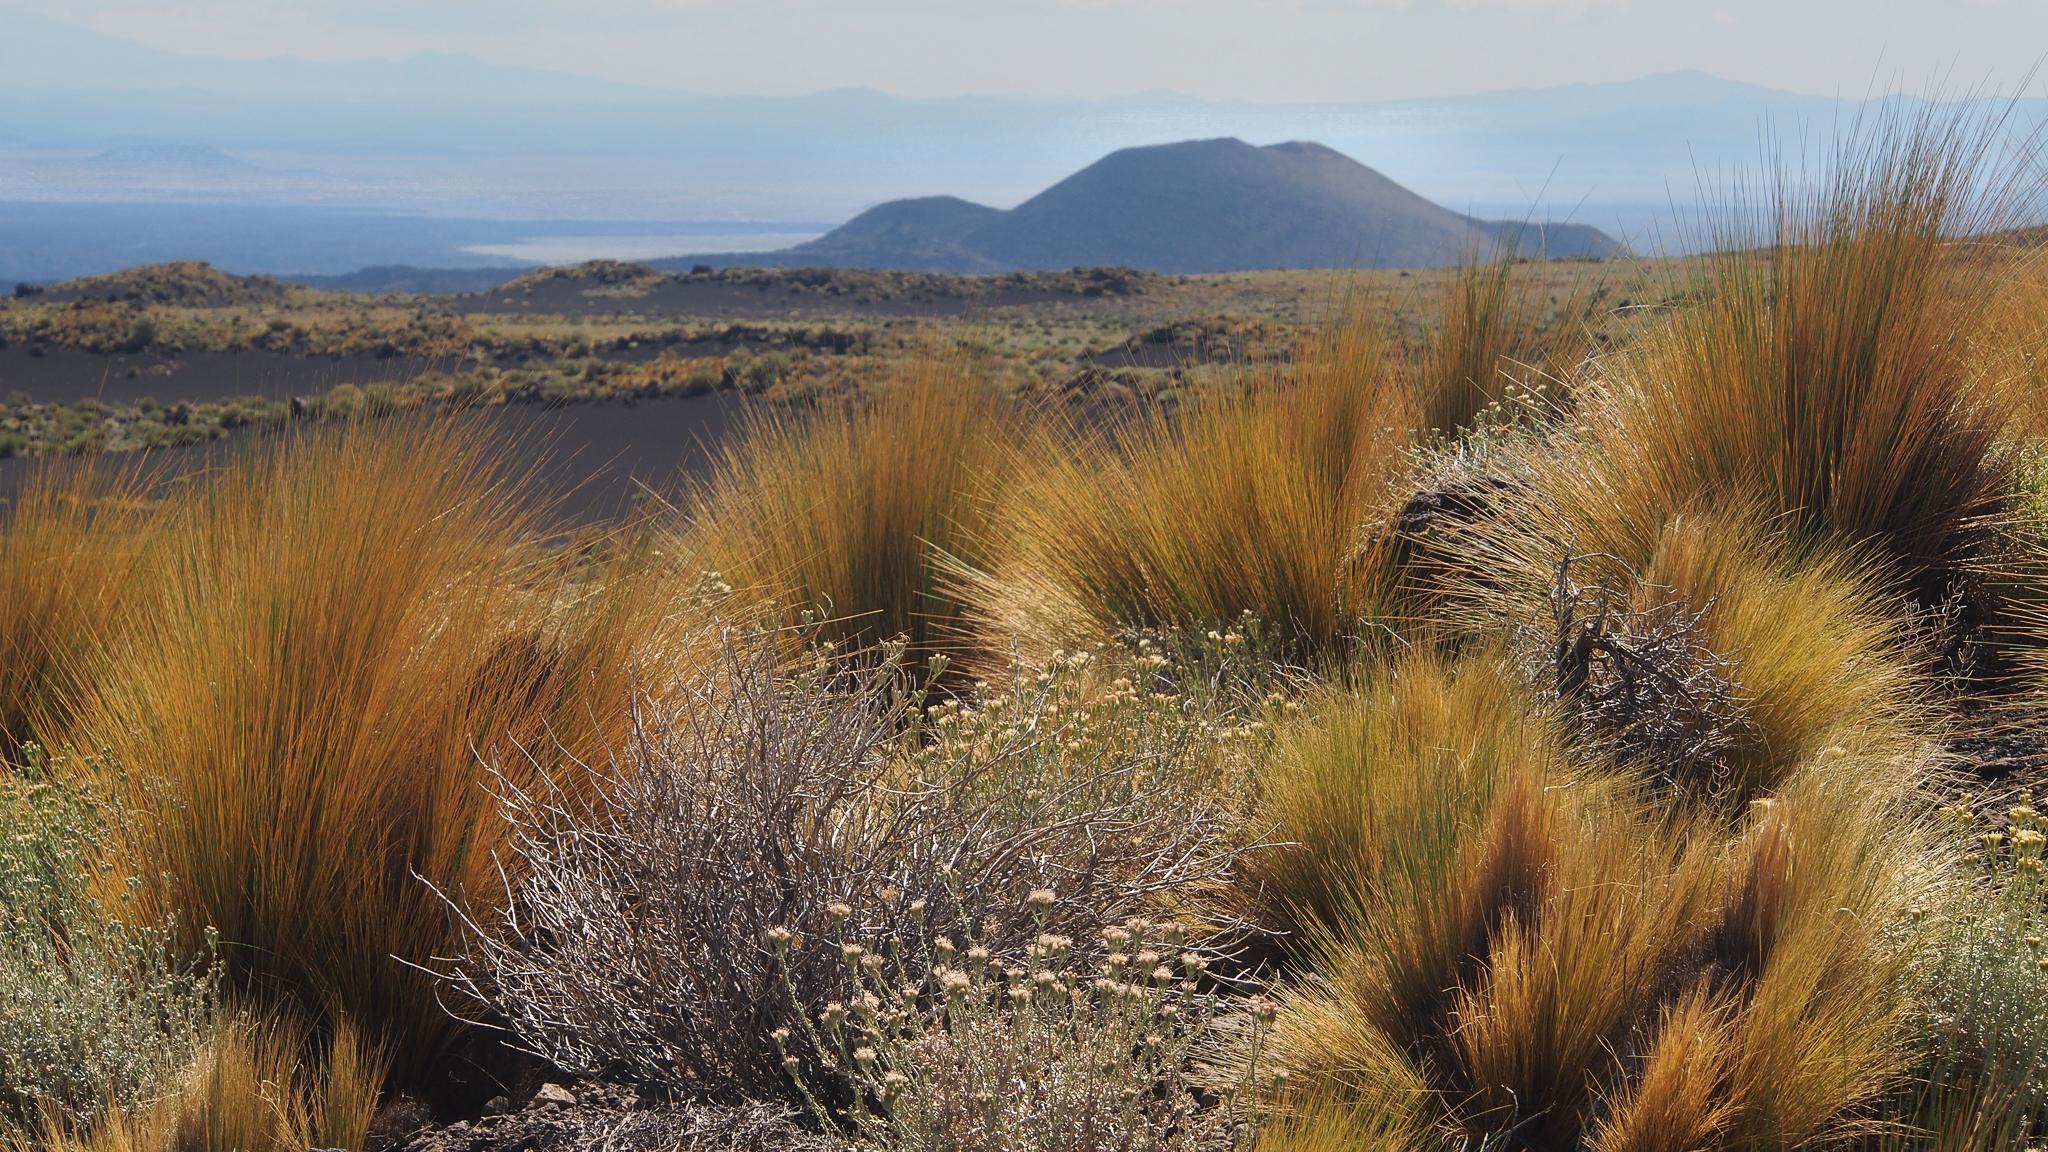 vegetation of the steppe, Argentina